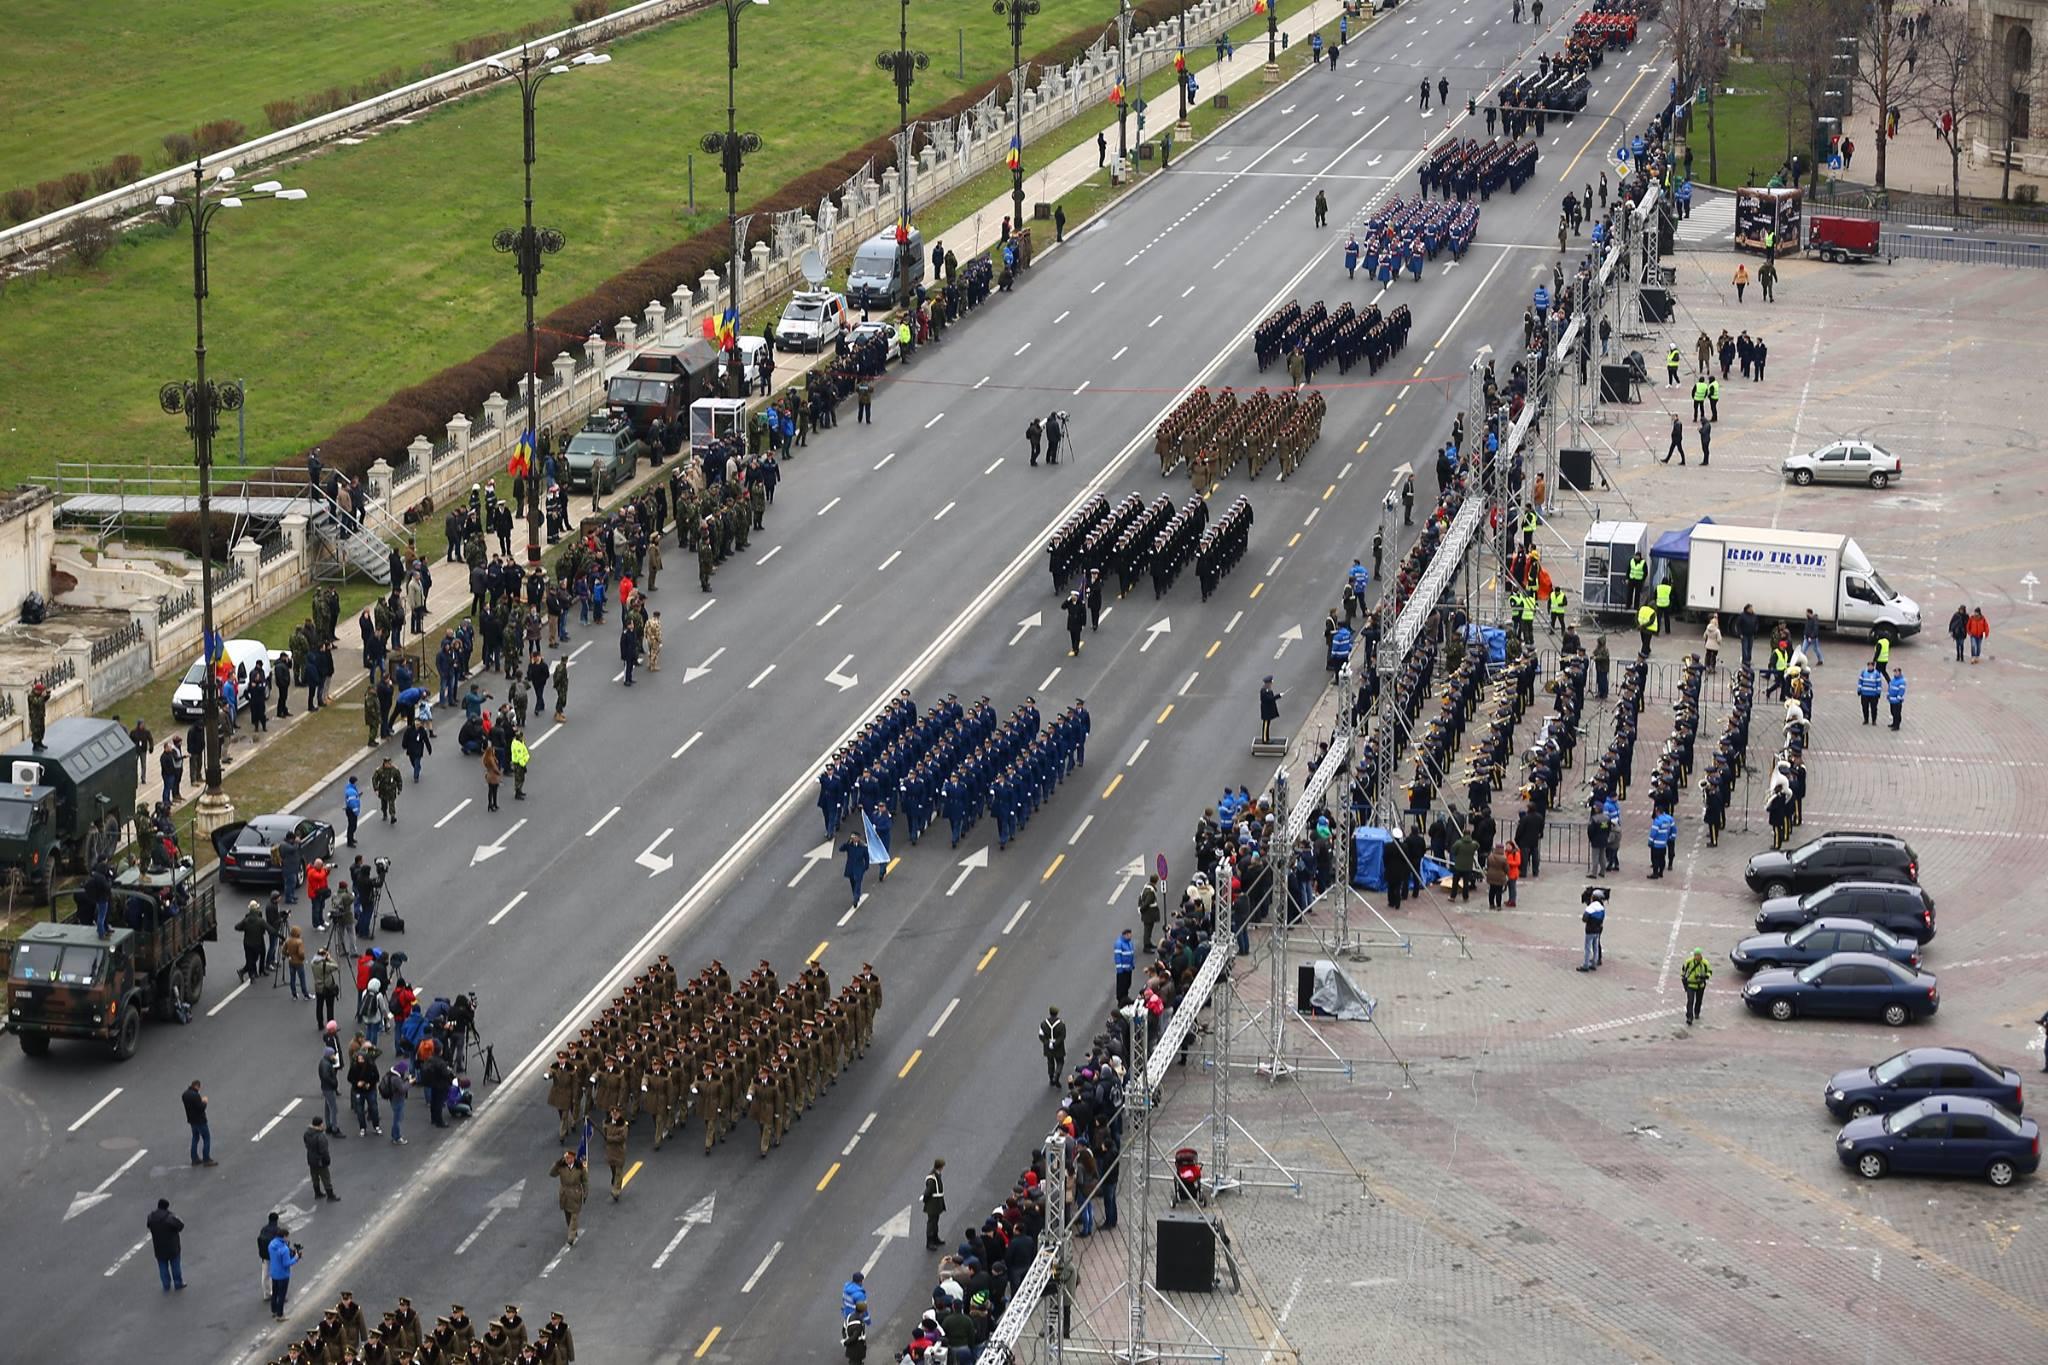 Repetitii parada militara 1 decembrie. Foto - MApN 12